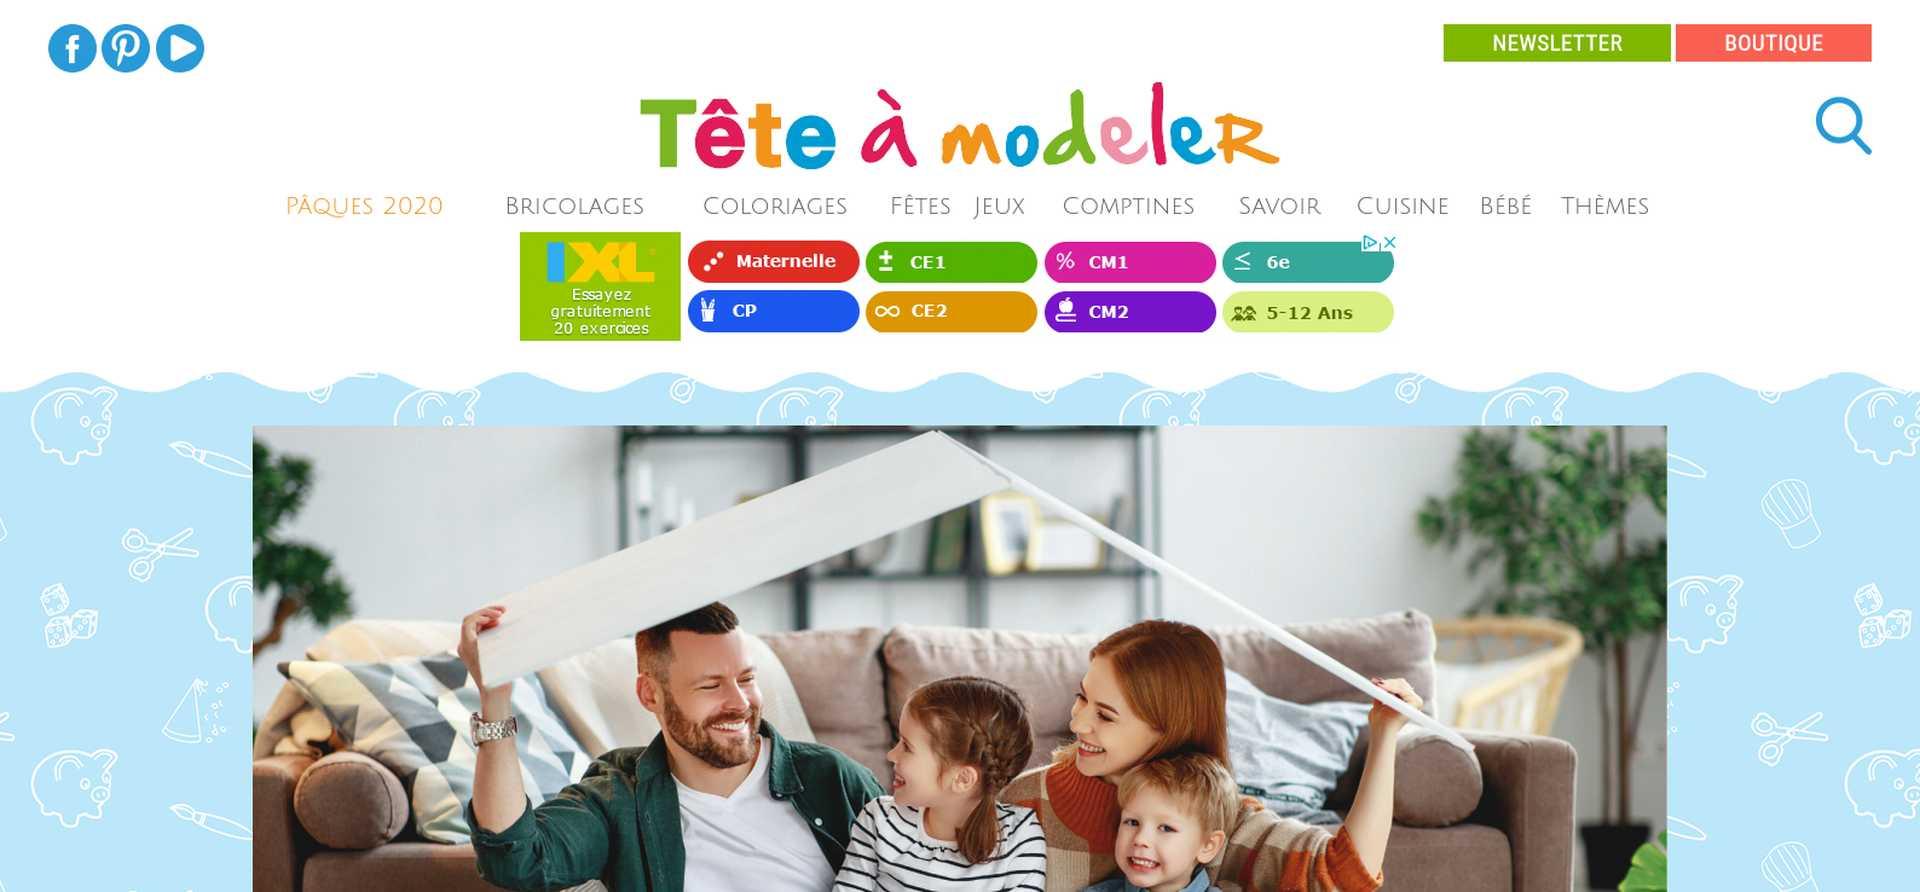 Image Teteamodeler